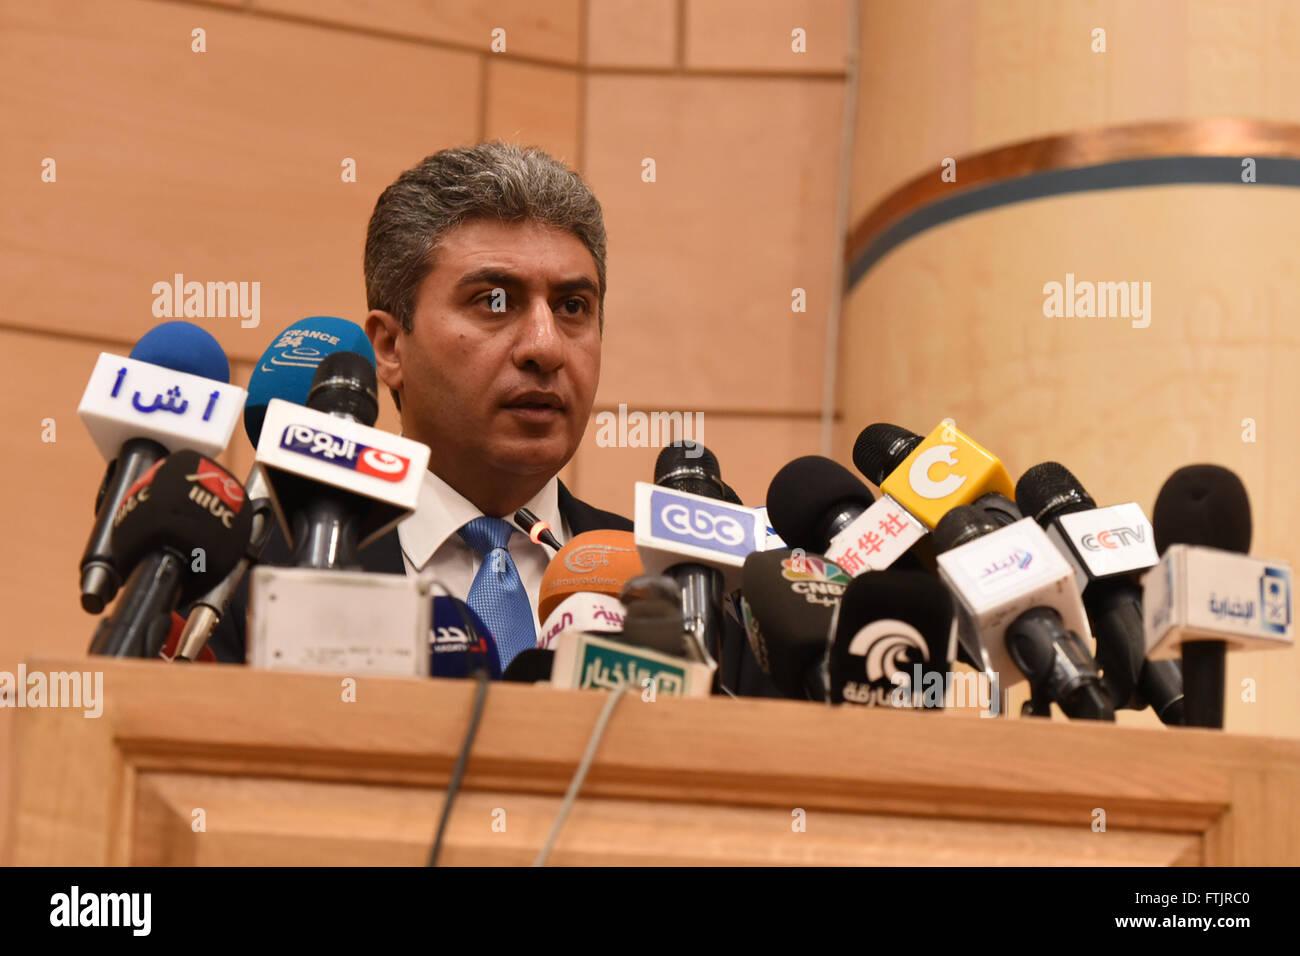 Cairo, Egypt  29th Mar, 2016  Egyptian Civil Aviation Minister